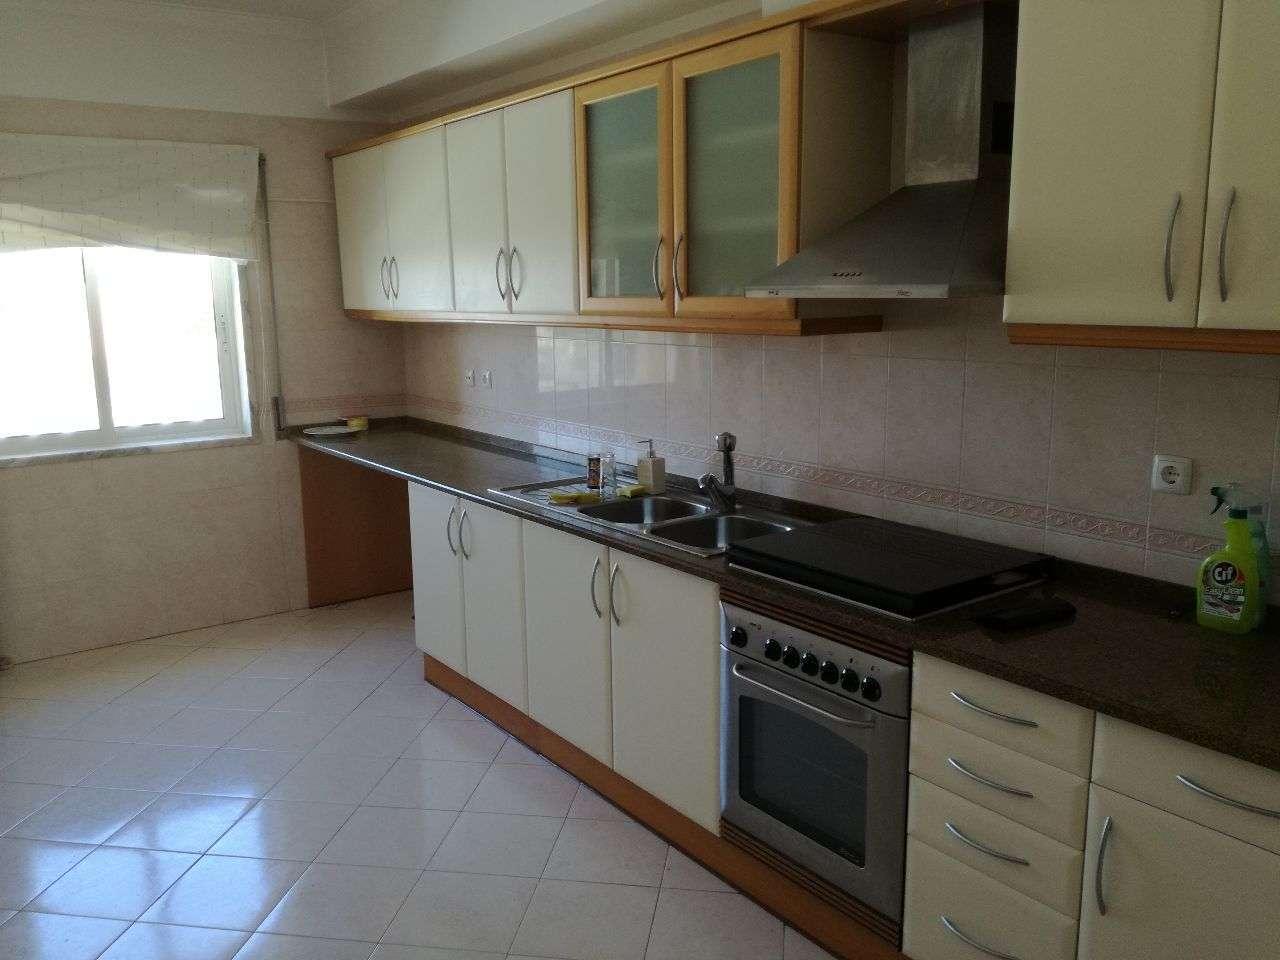 Apartamento para comprar, Santa Clara, Lisboa - Foto 6